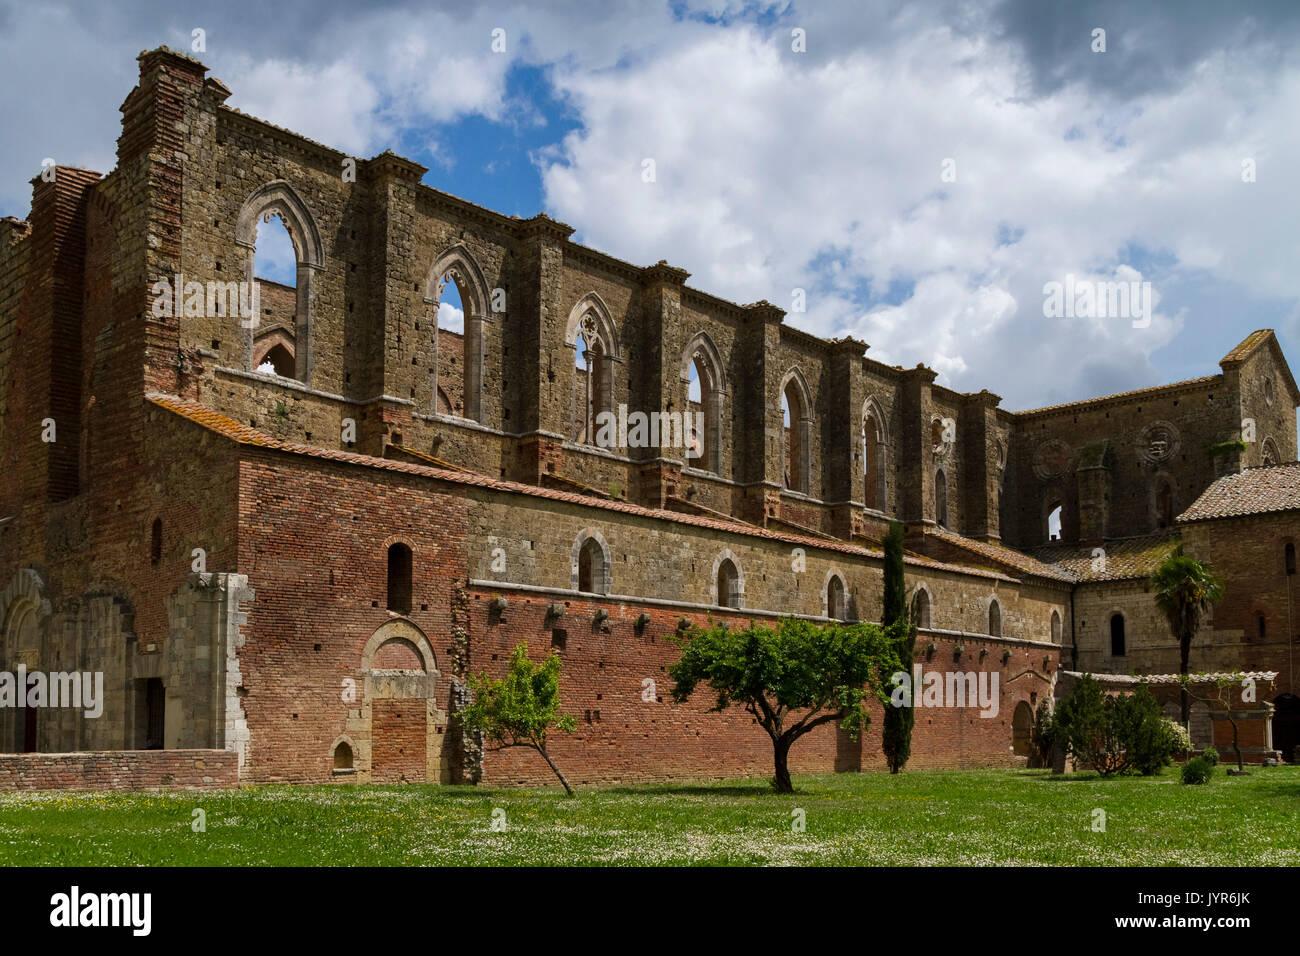 View of the roofless cistercian abbey of San Galgano, near Chiusdino, Siena district, Tuscany, Italy. Stock Photo